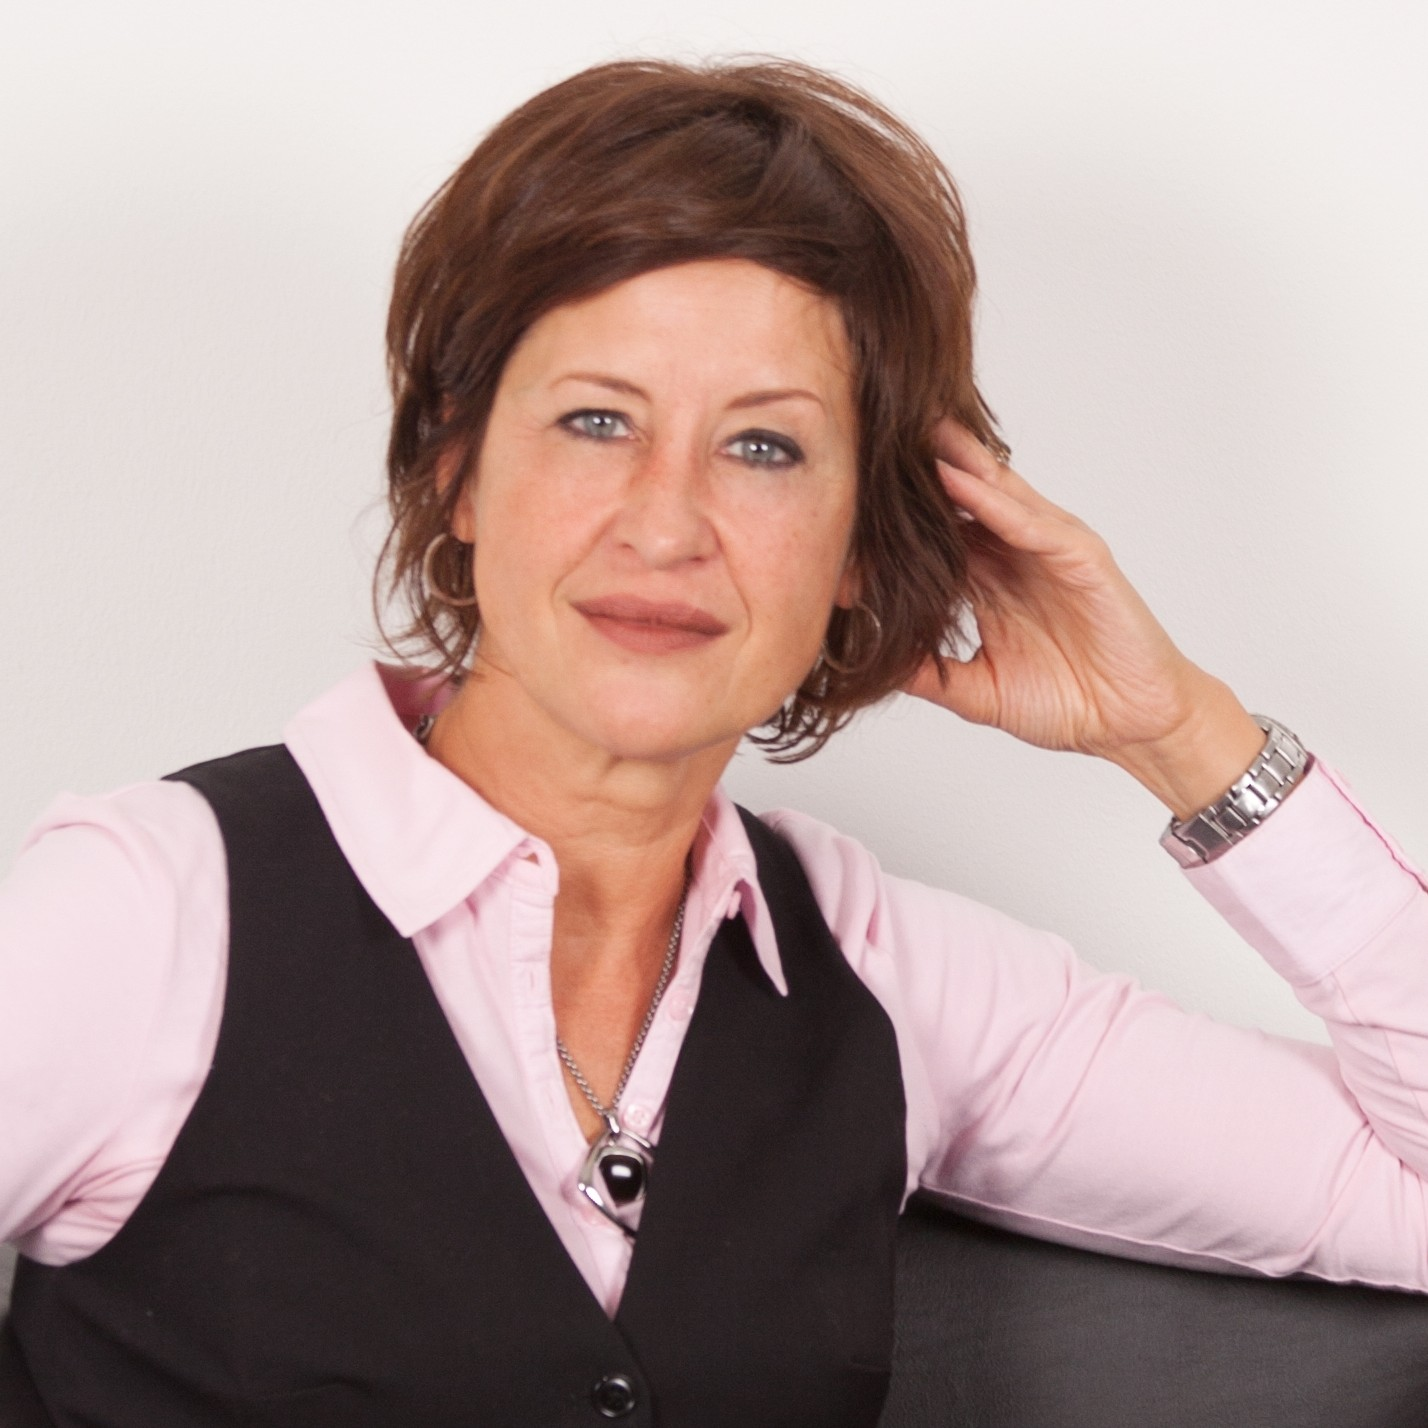 Angelika Schutzbach-Böhme